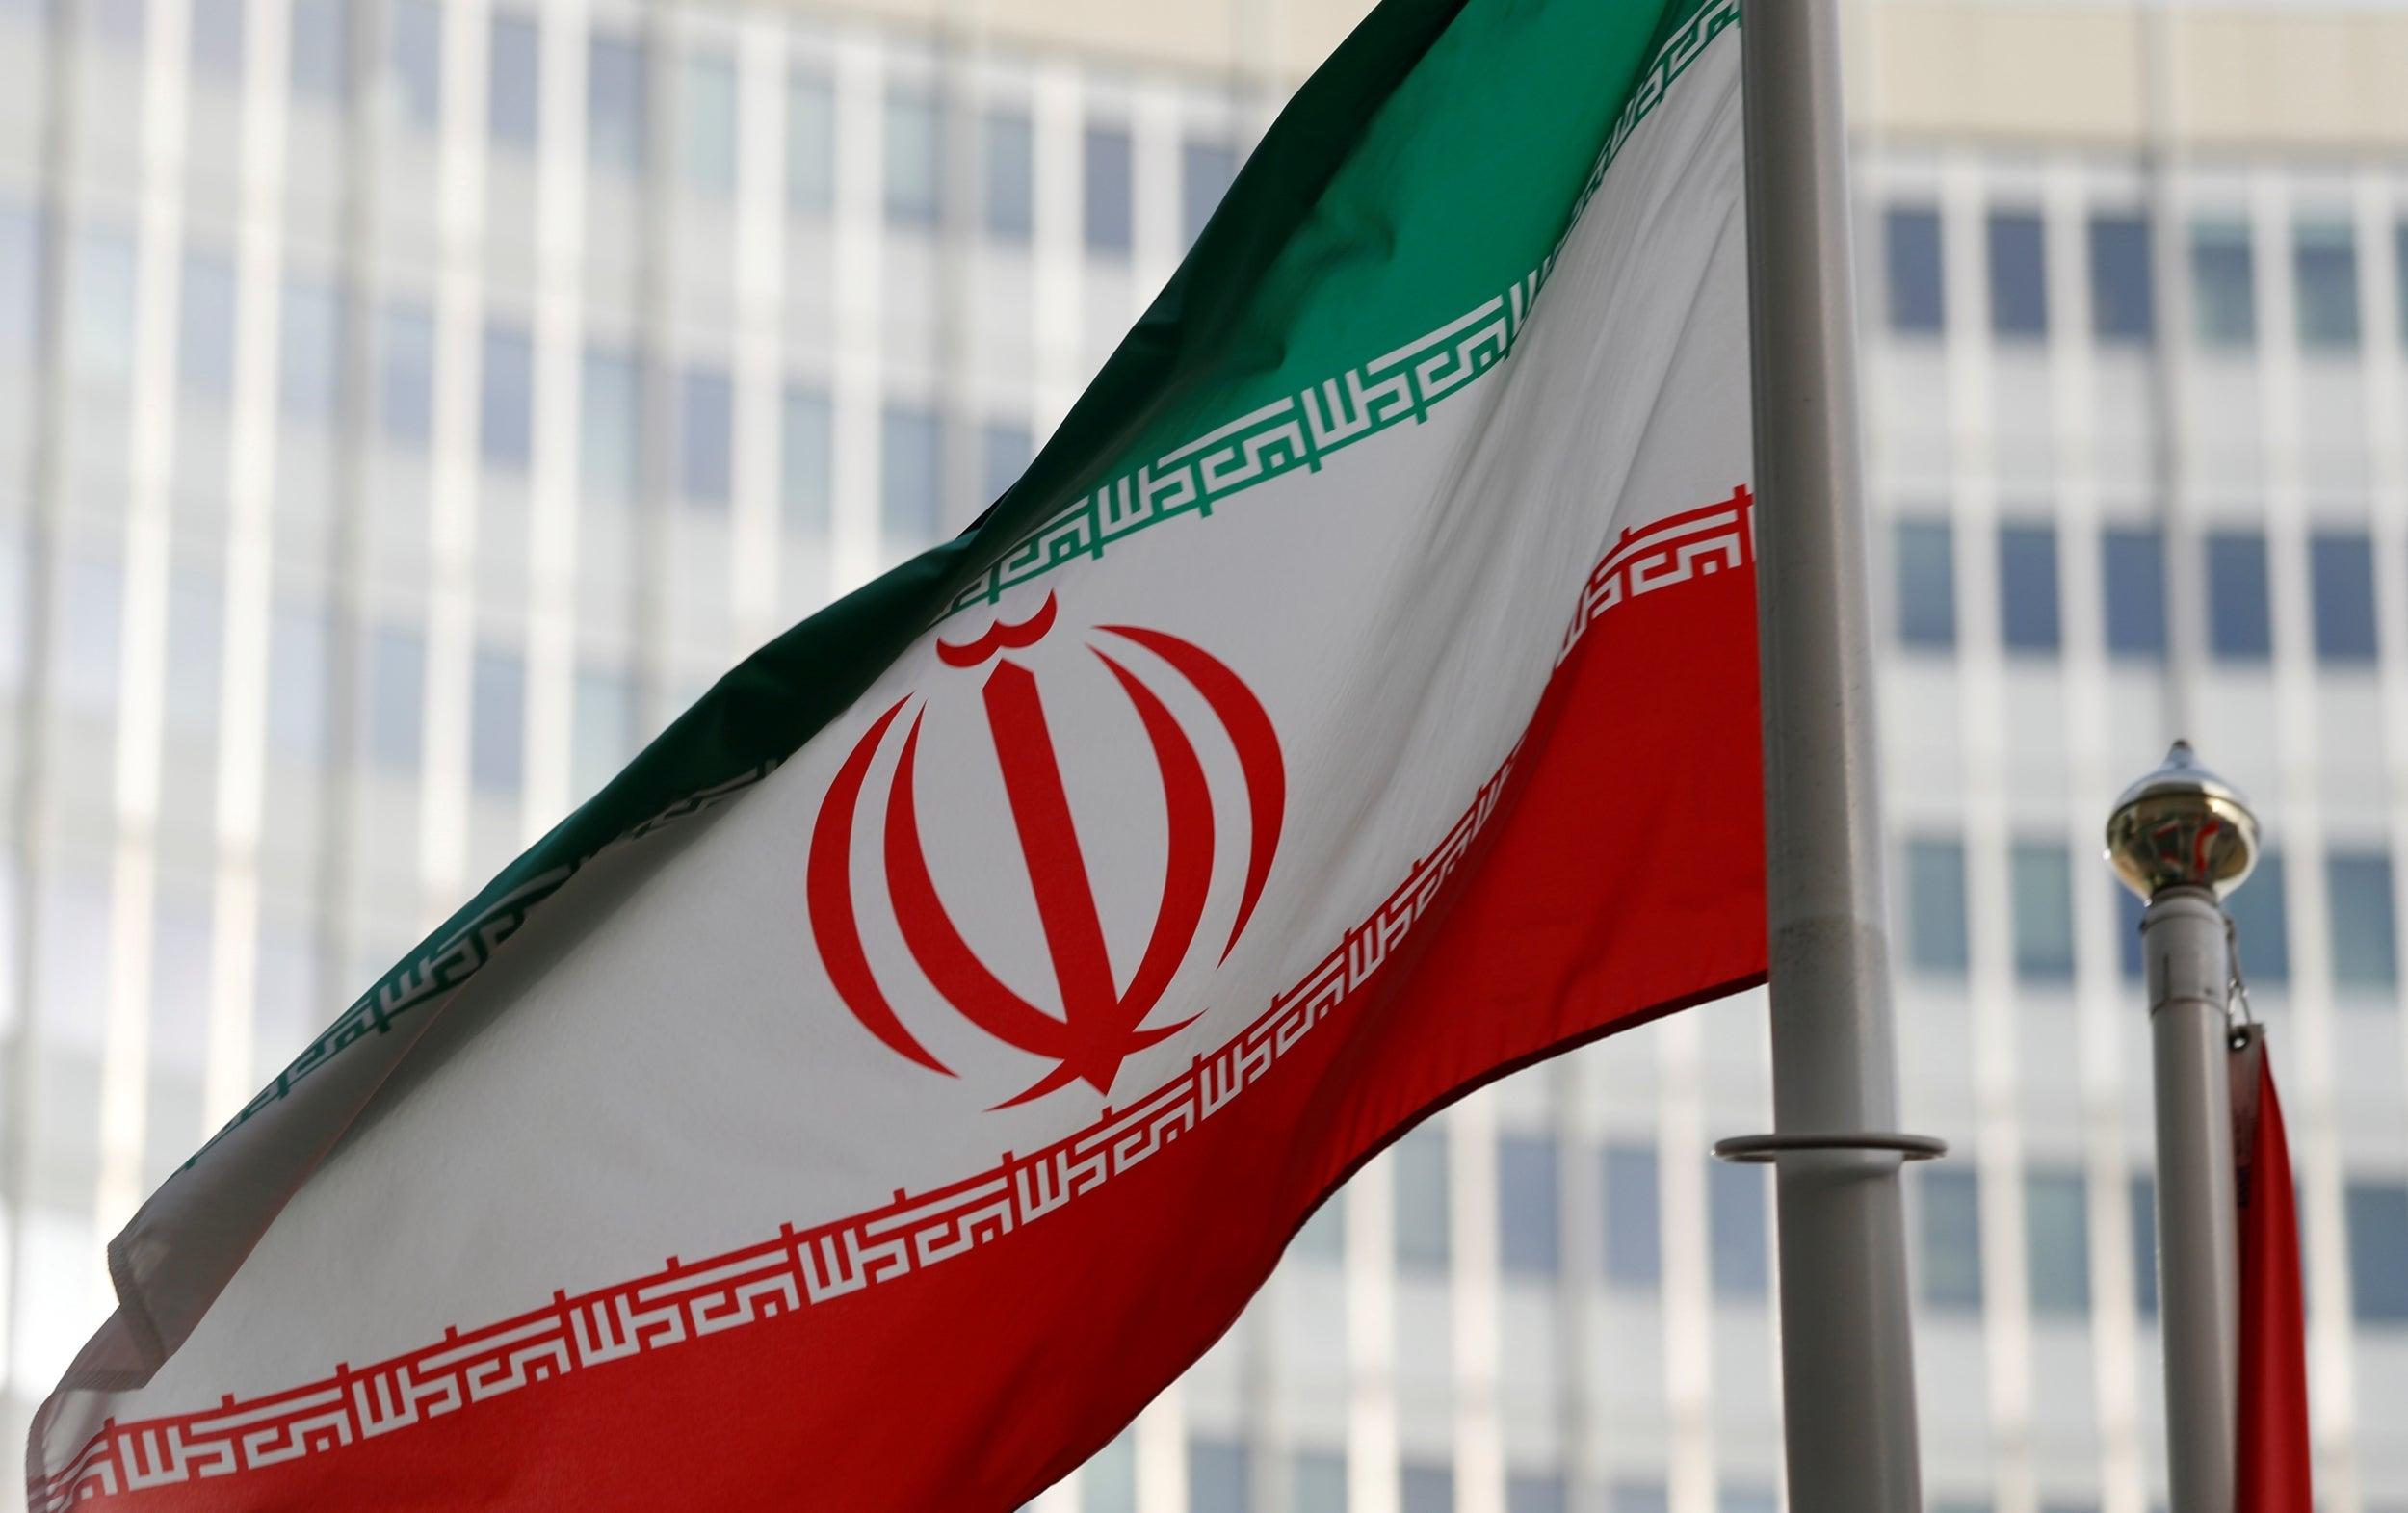 Anoosheh Ashoori: Iran jails British national for 10 years on spying charges